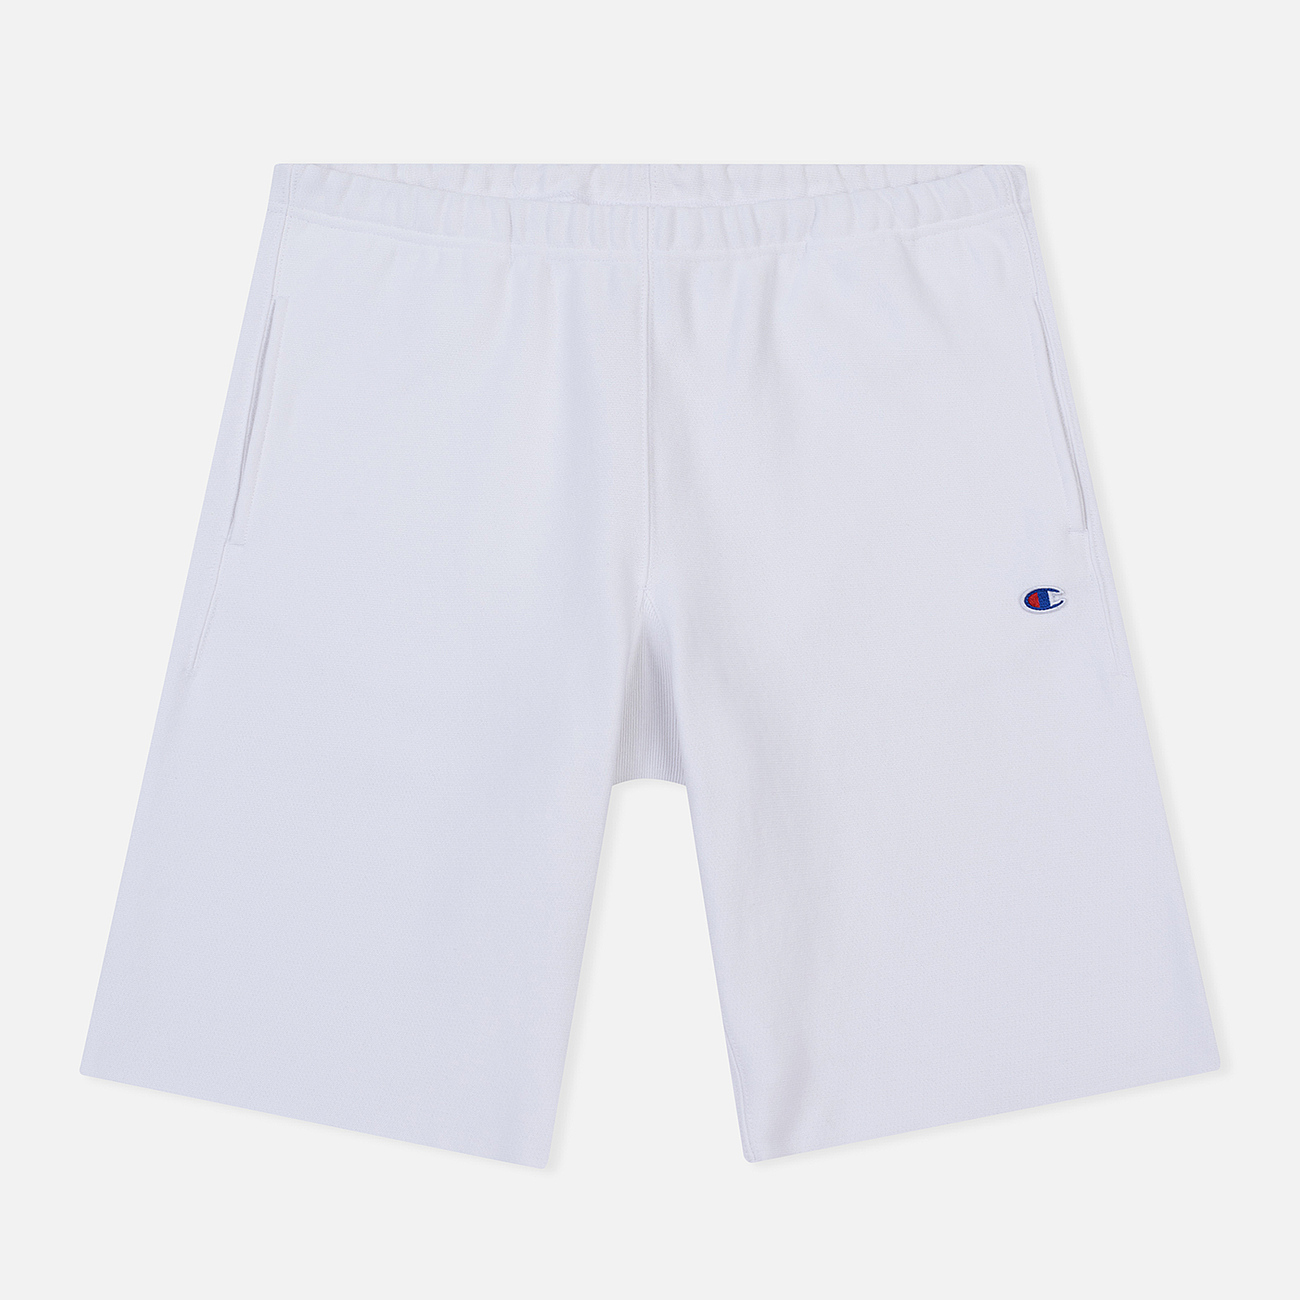 Мужские шорты Champion Reverse Weave Bermuda Brushed Fleece White